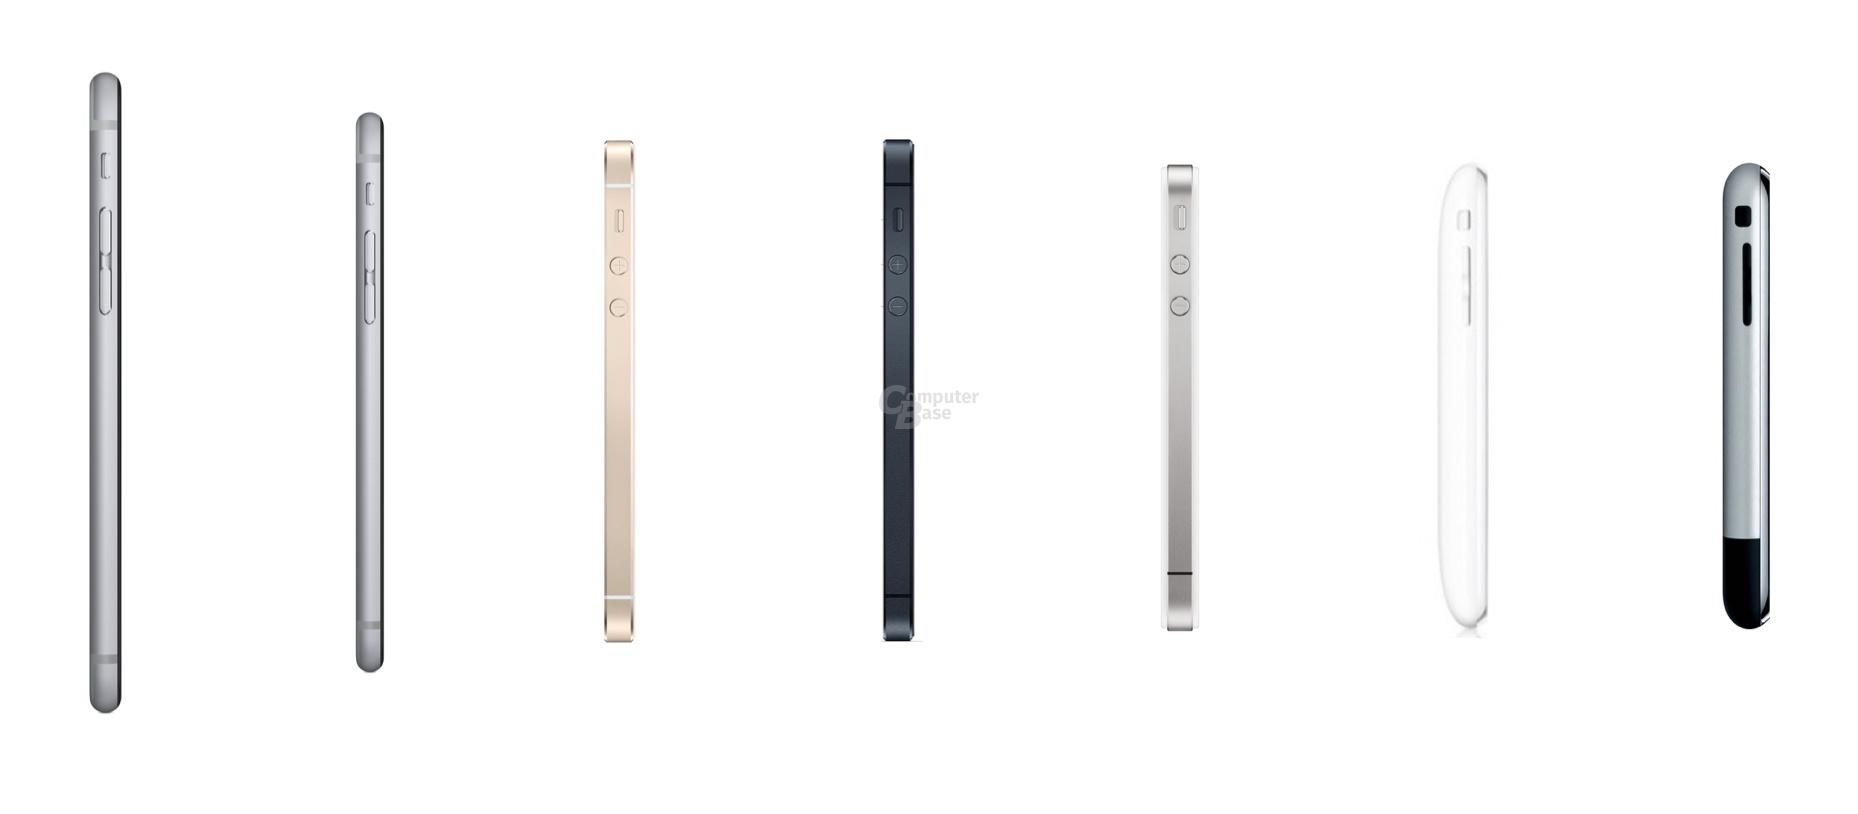 v.l.n.r.: iPhone 6 (Plus), 5S, 5, 4S/4, 3GS/3G und iPhone (Seite)